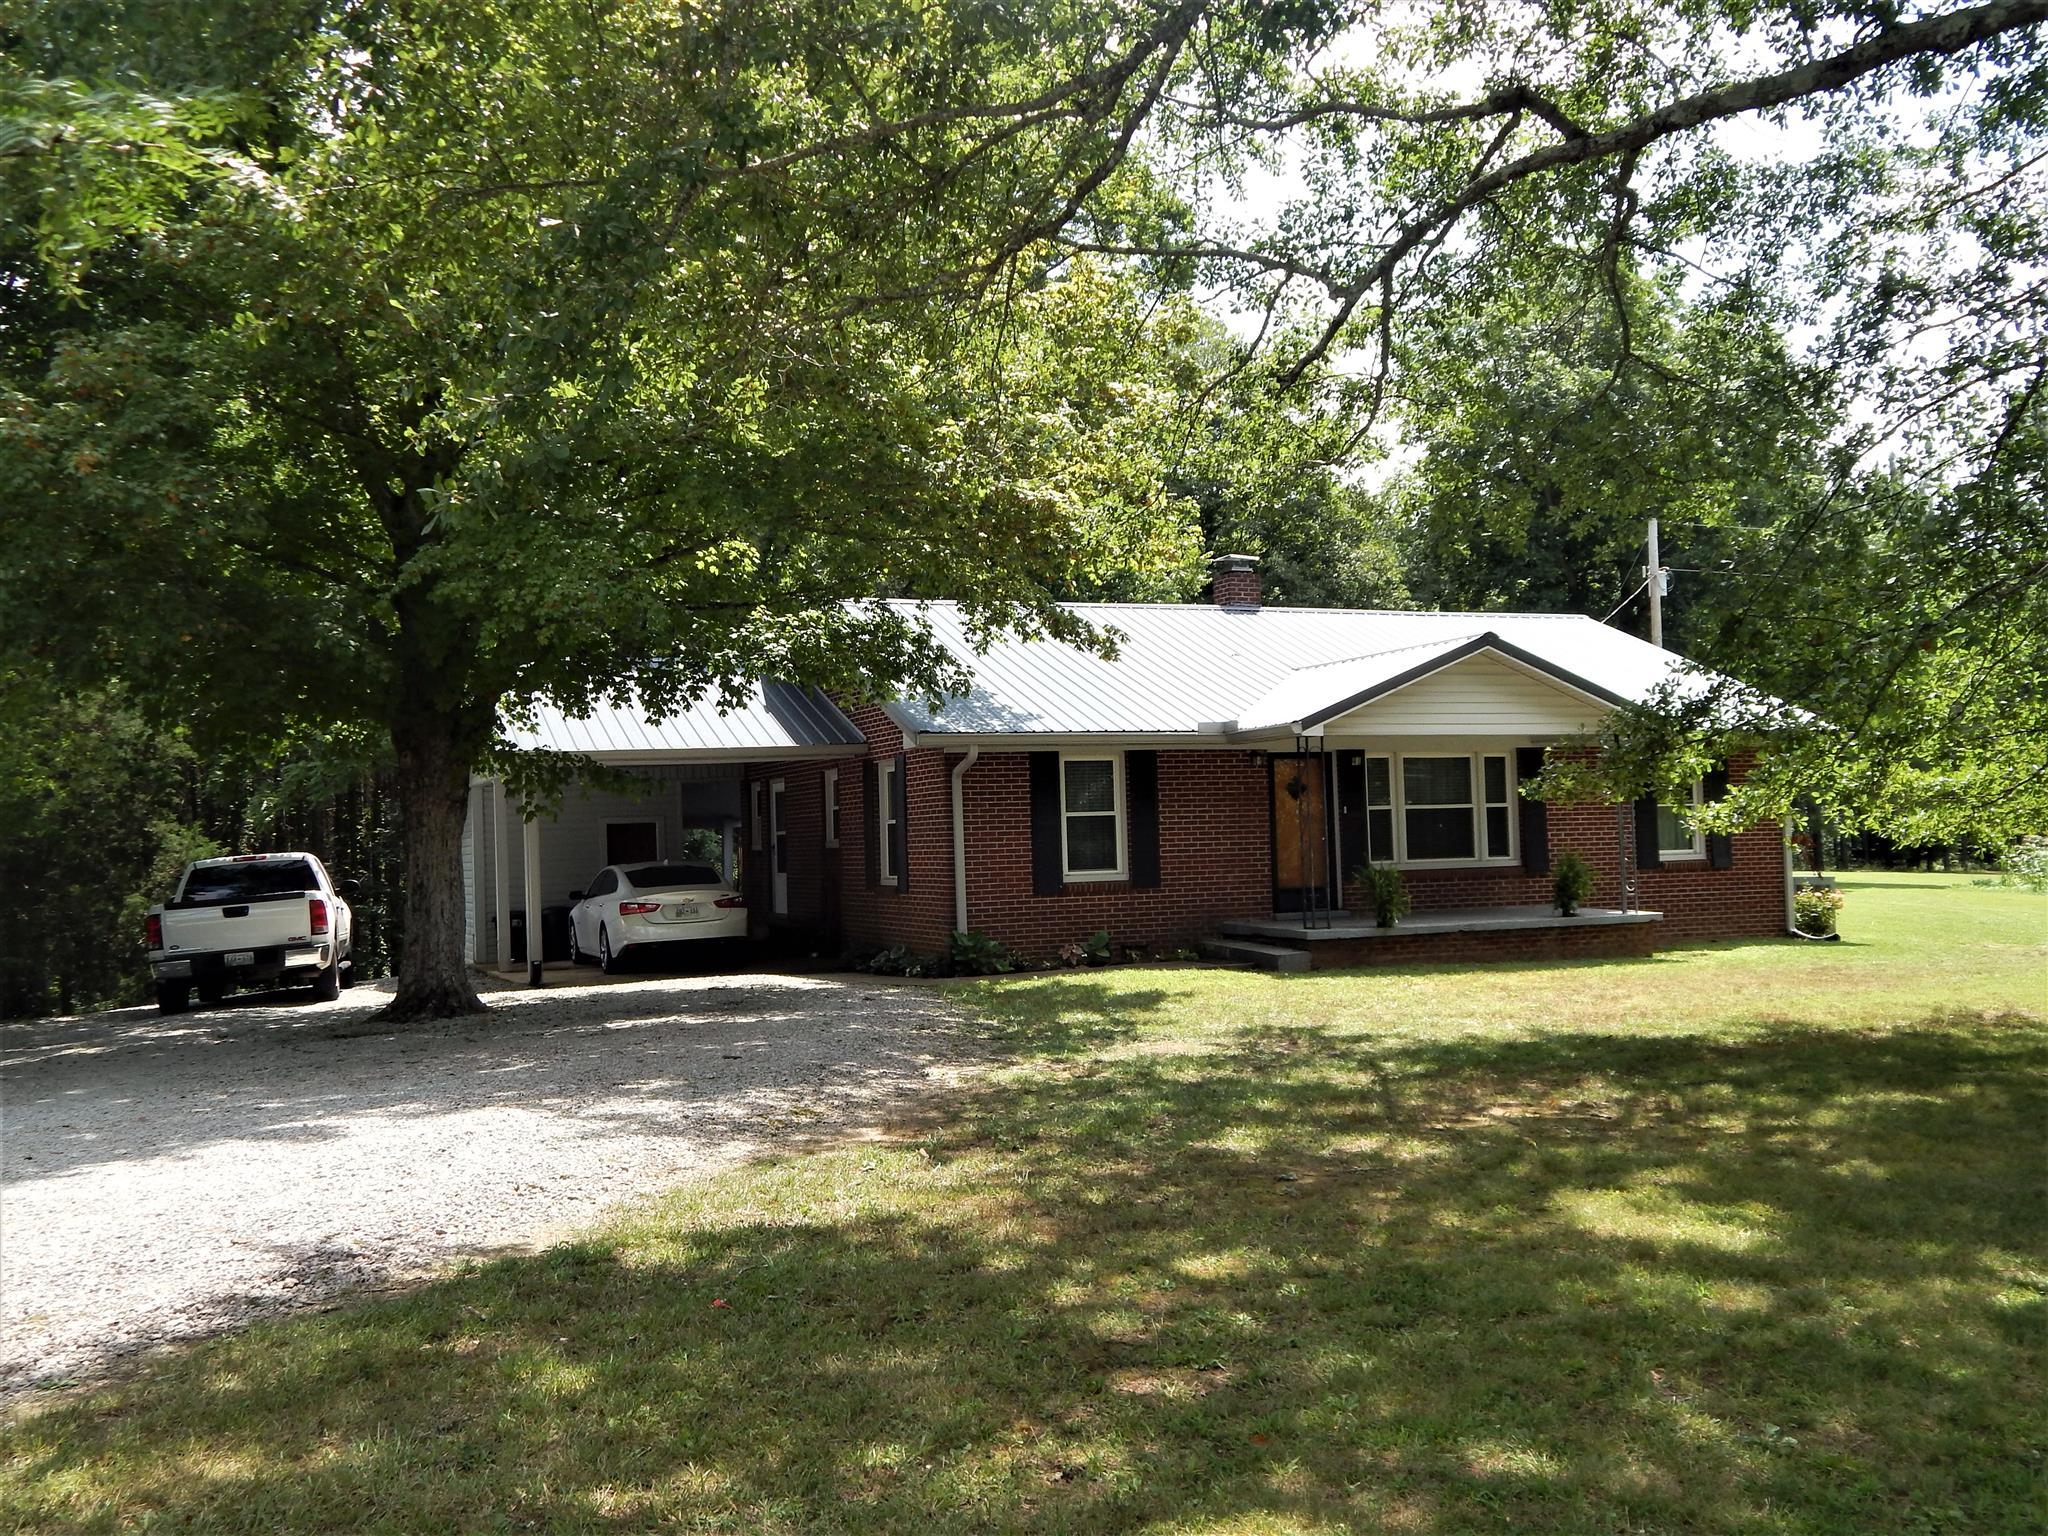 10815 Brooksie Thompson Rd, Bath Springs, TN 38311 - Bath Springs, TN real estate listing